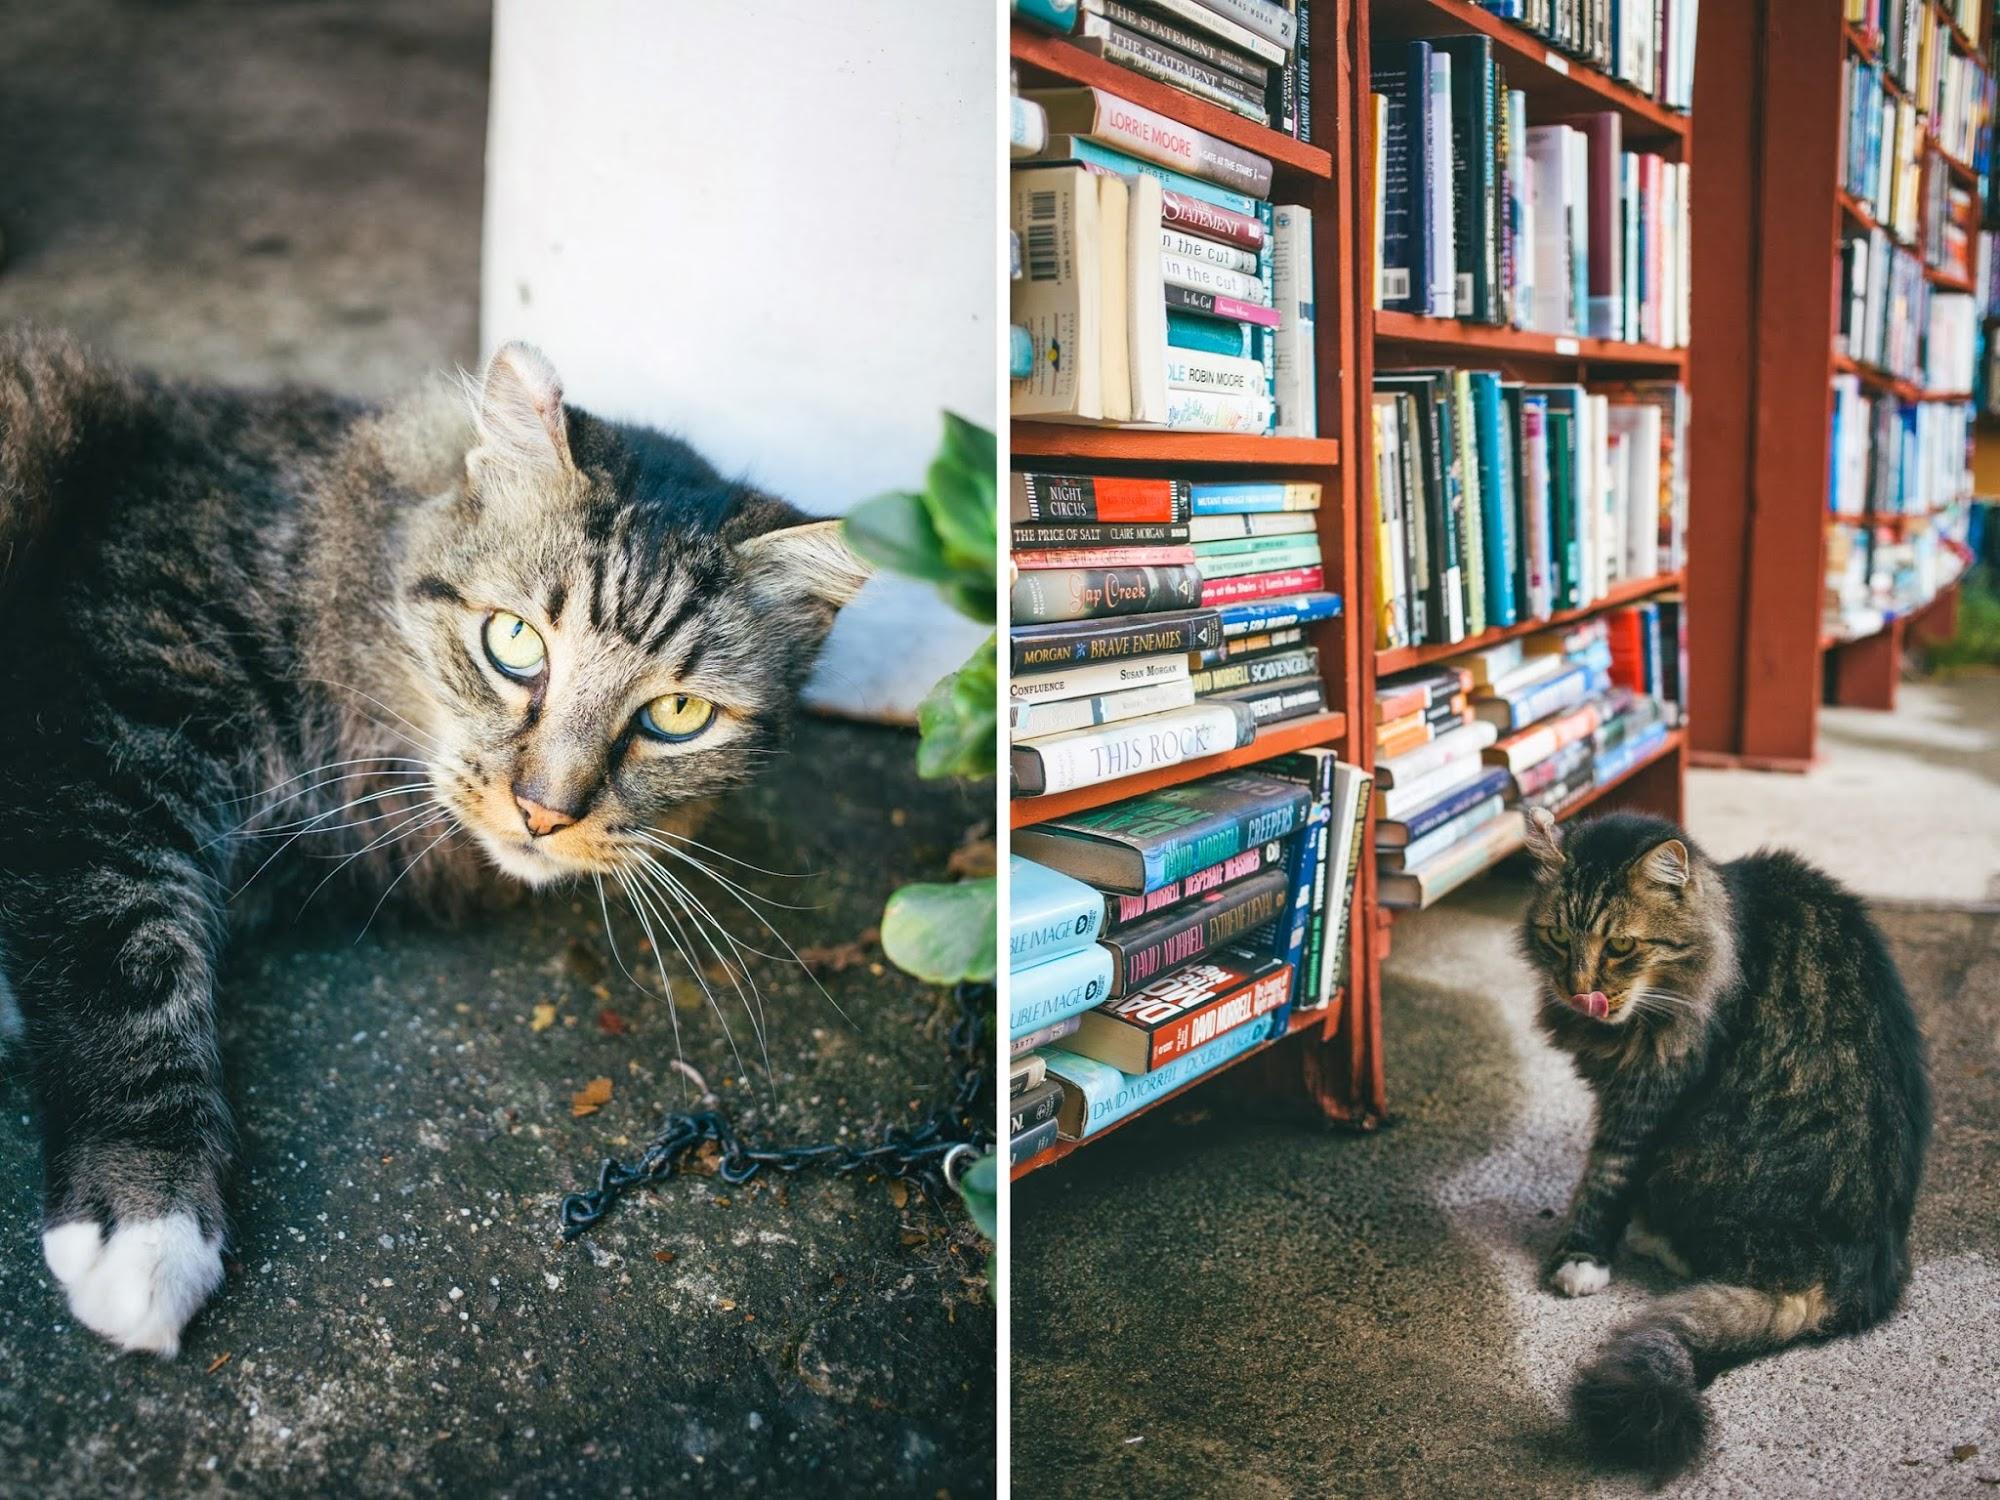 barts+books+ojai+cat.jpg